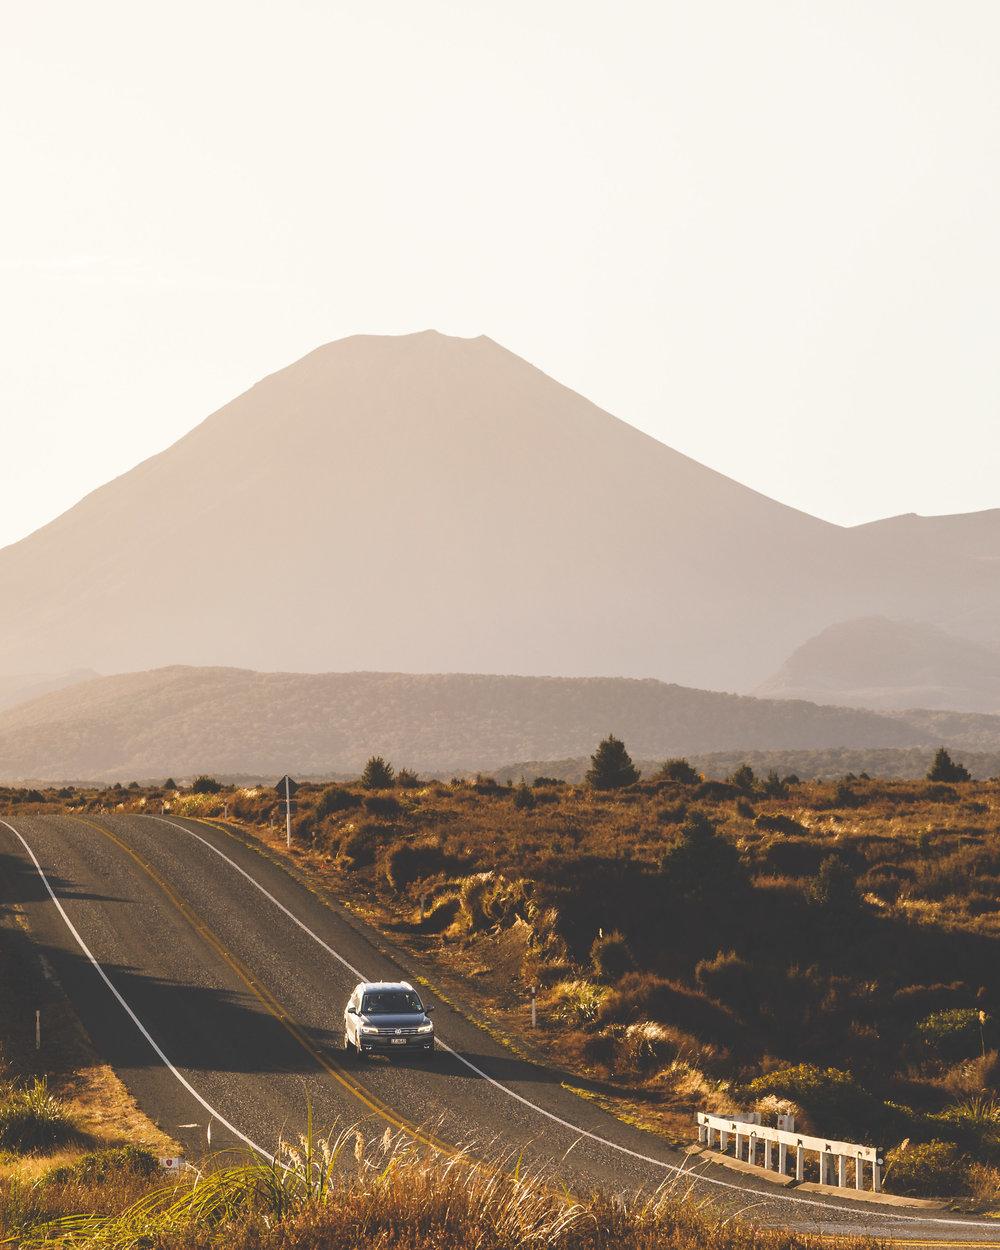 Most Instagrammable spots in New Zealand: Desert Road